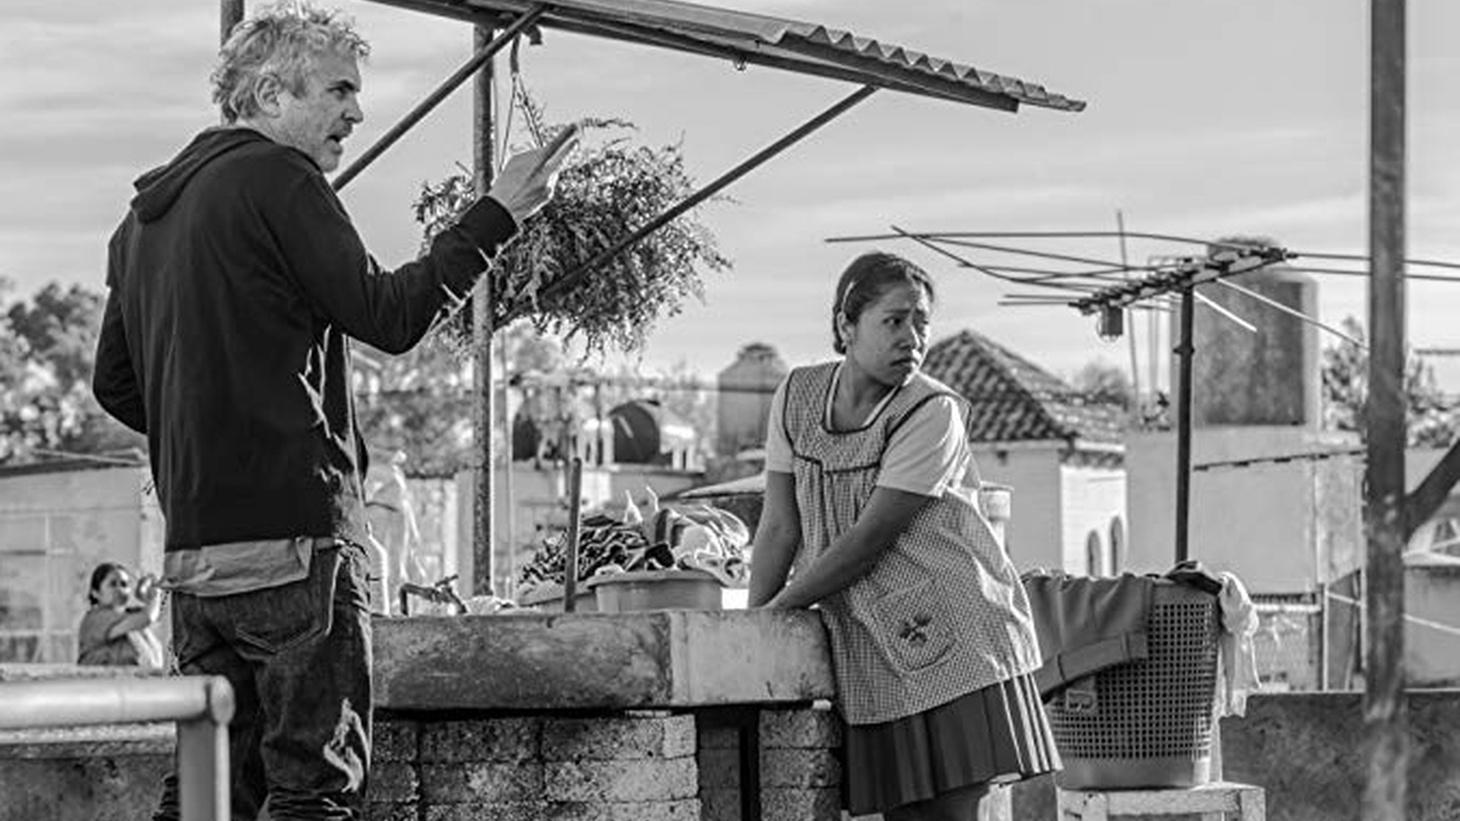 'Roma' director Alfonso Cuarón and star Yalitza Aparicio